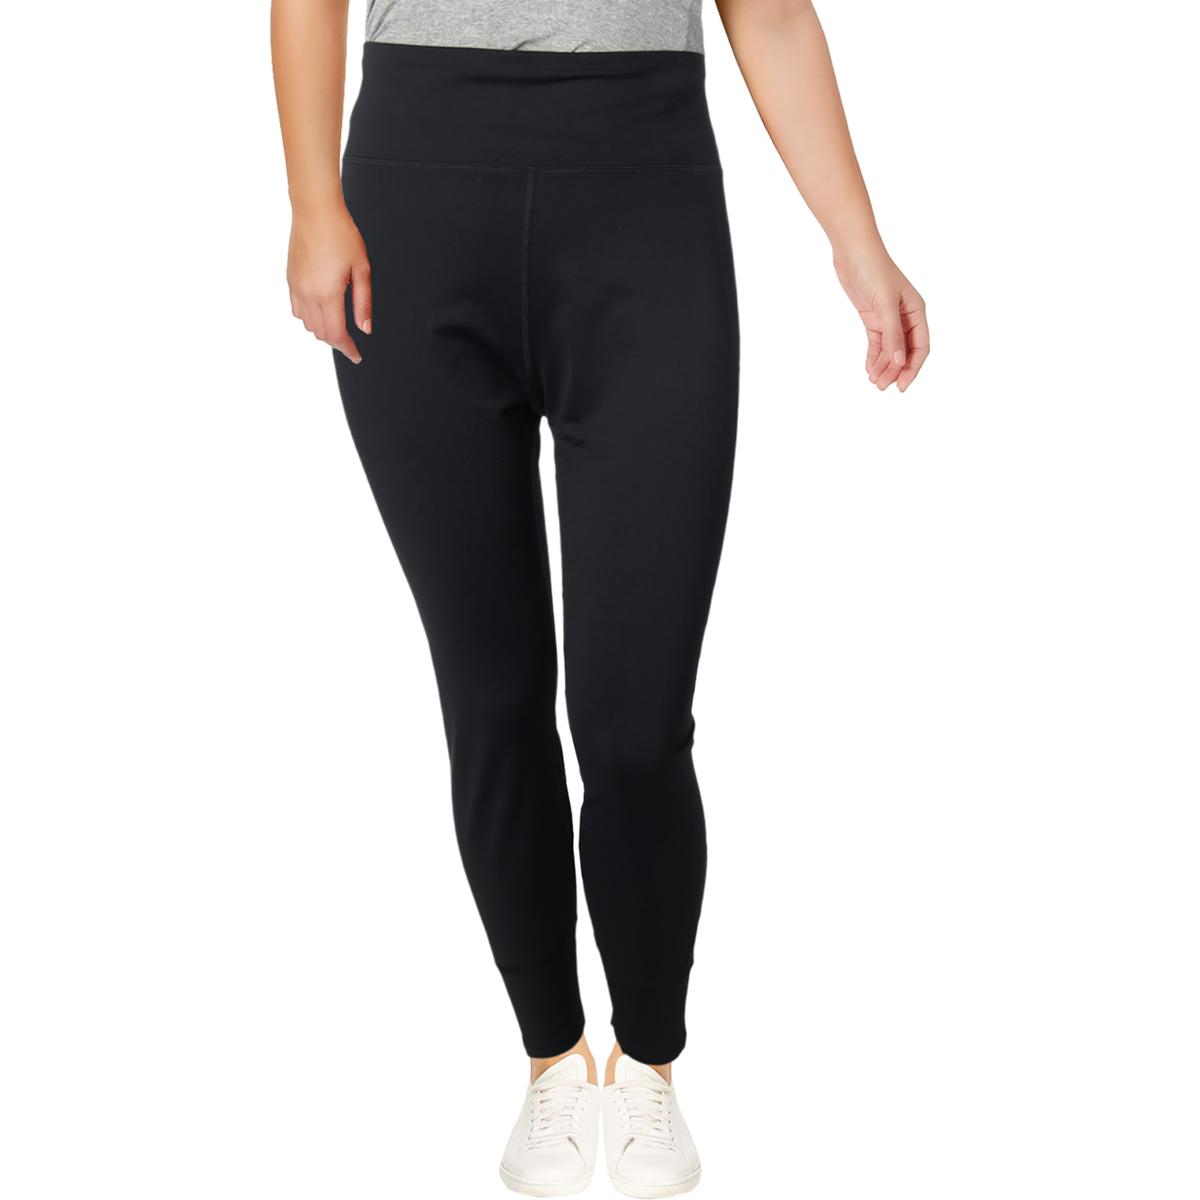 137190df81 SHAPE Activewear Plus Womens Yoga Running Athletic Leggings